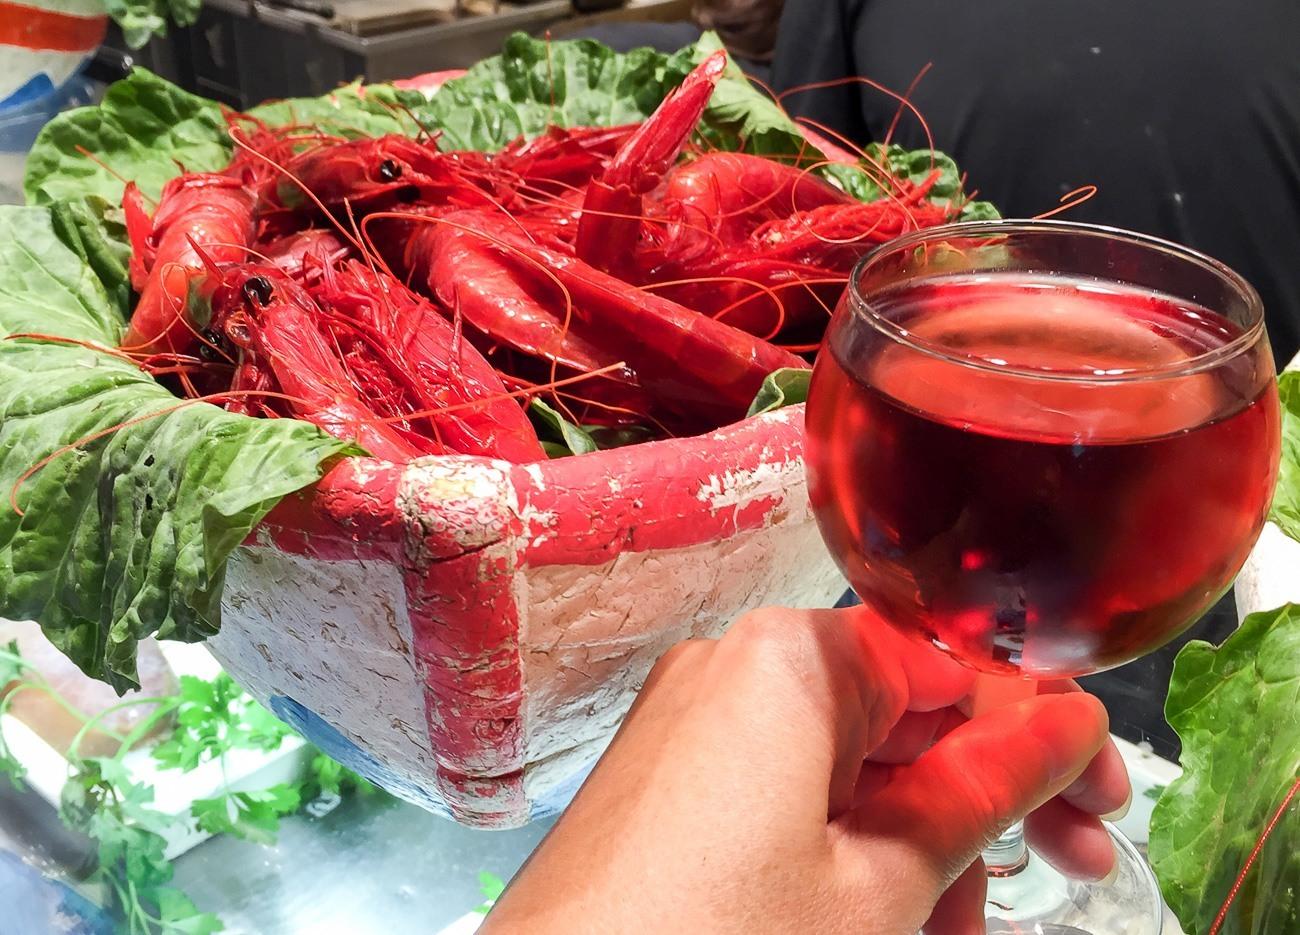 Fresh seafood and rose at BarCentral in Barcelona's La Boqueria food market.